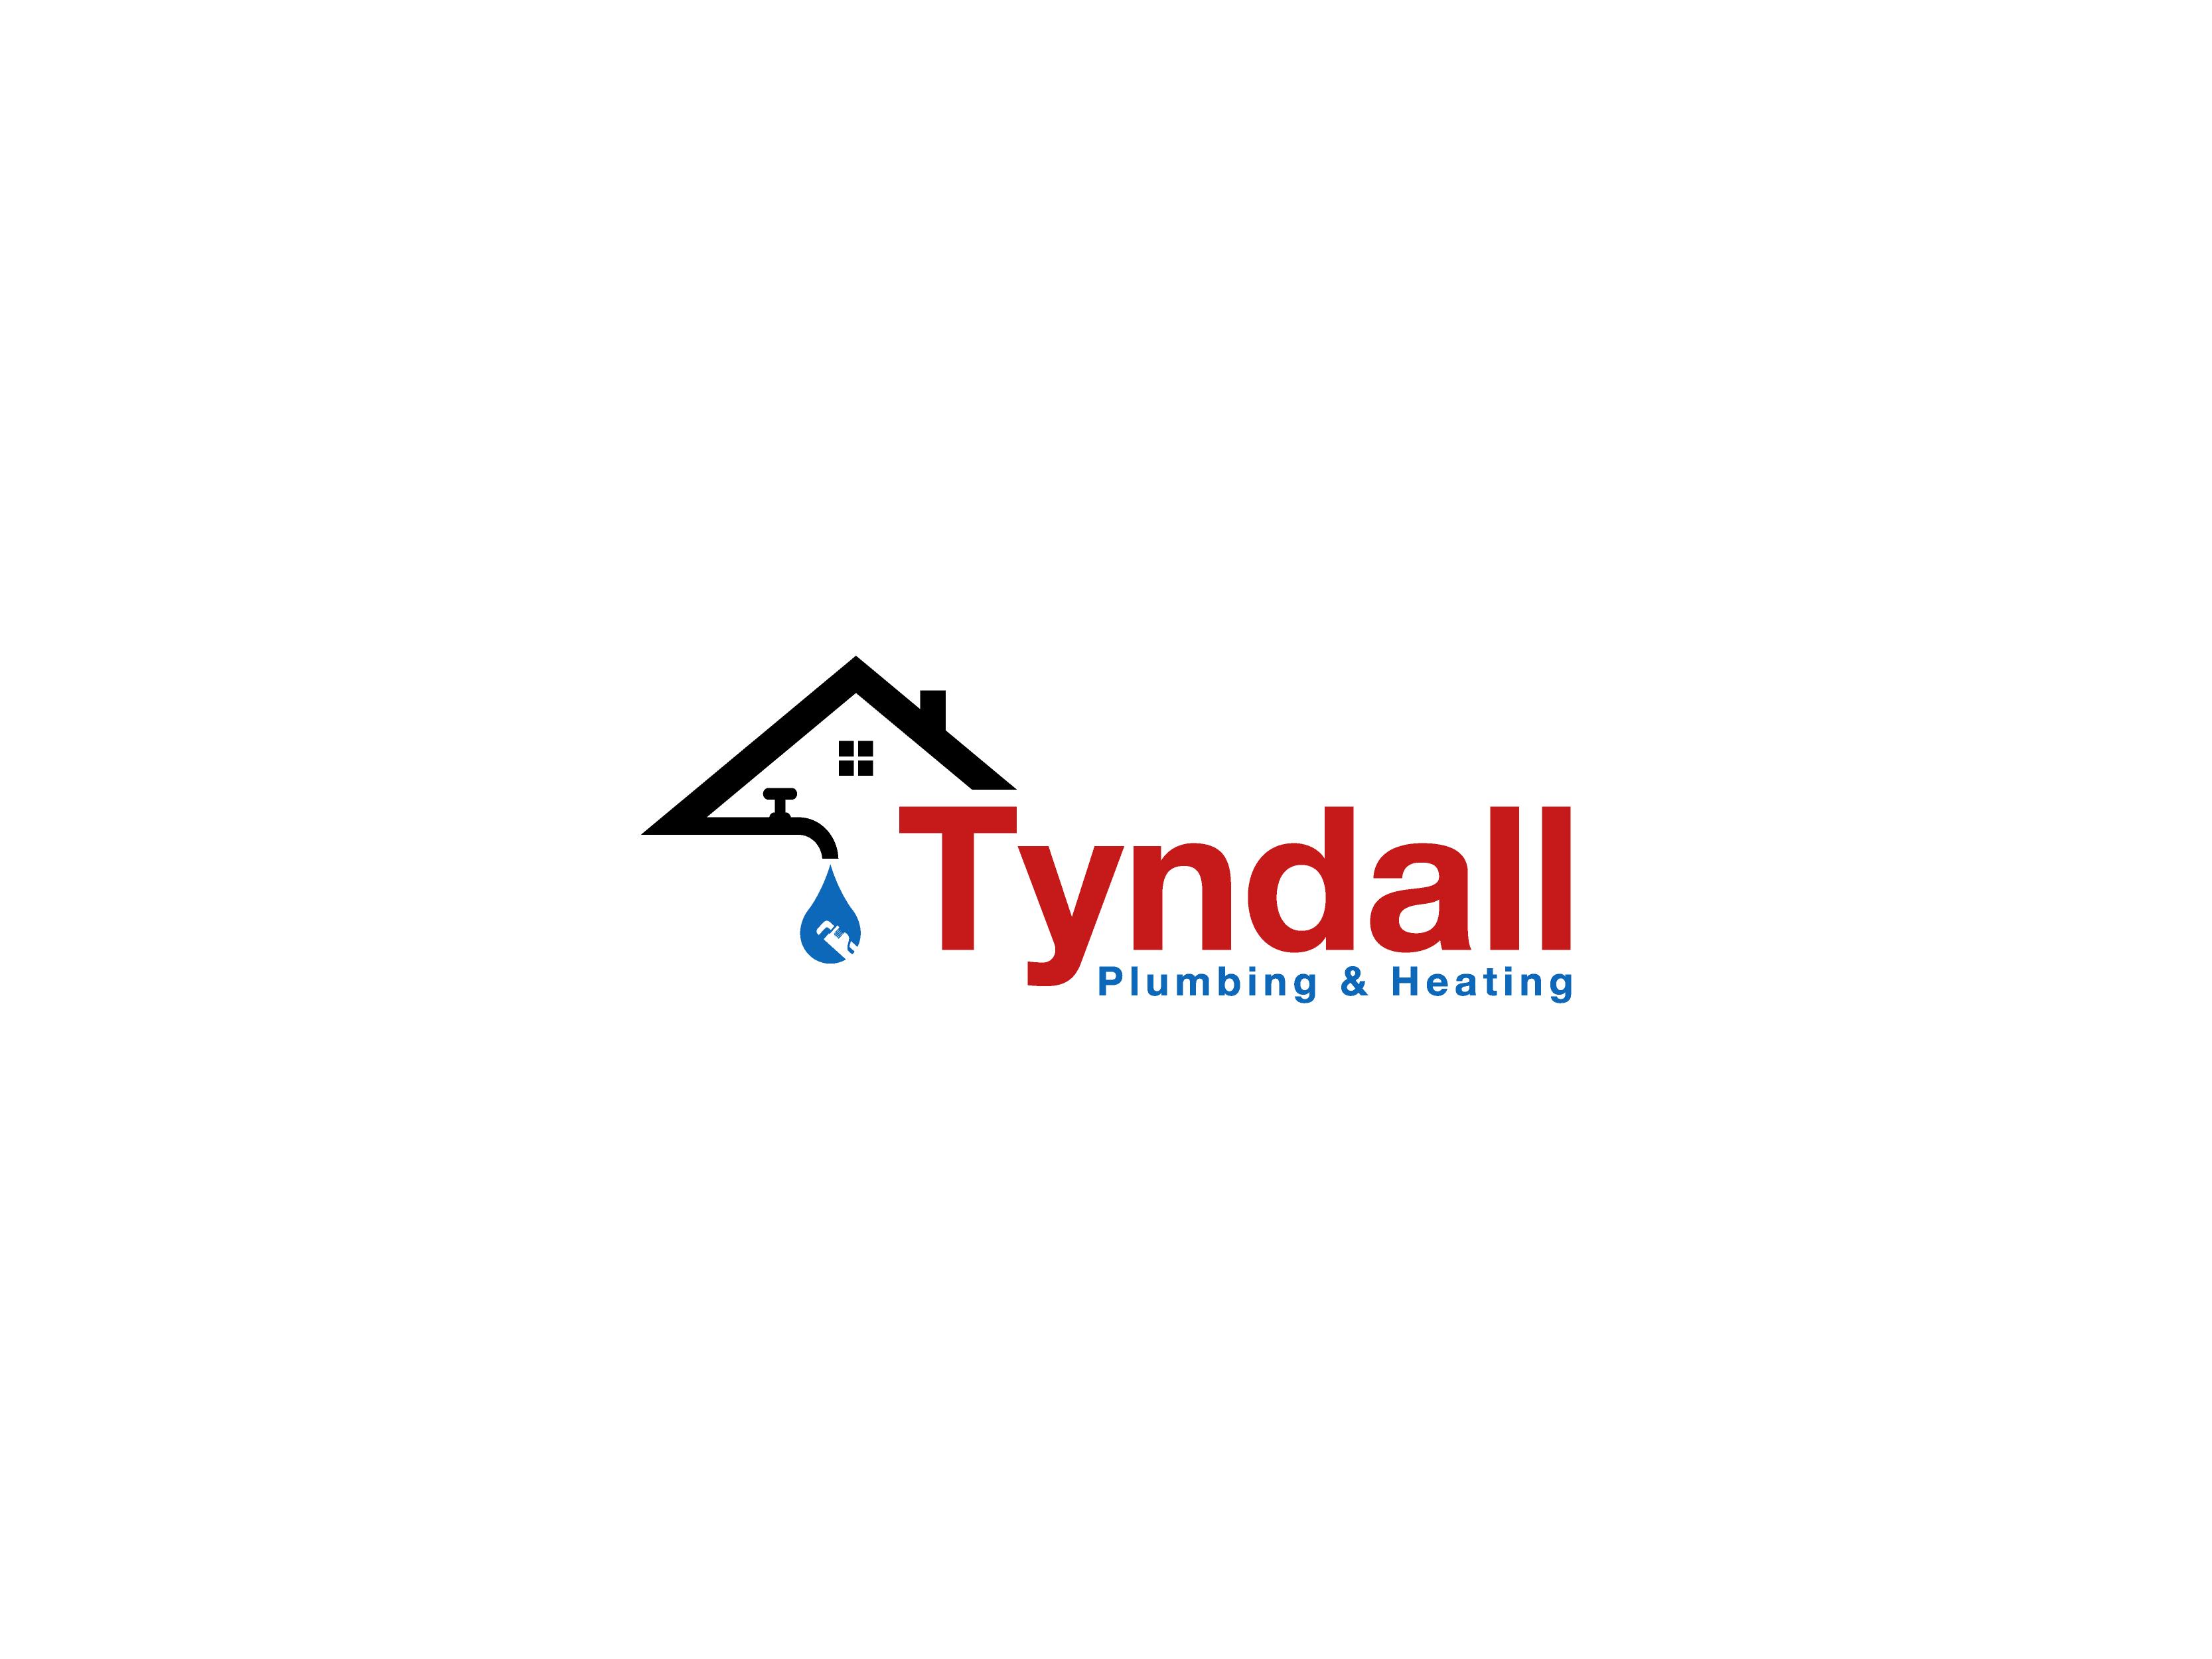 Logo Design by Shivaprasad Sangondimath - Entry No. 66 in the Logo Design Contest Imaginative Logo Design for Tyndall Plumbing & Heating.